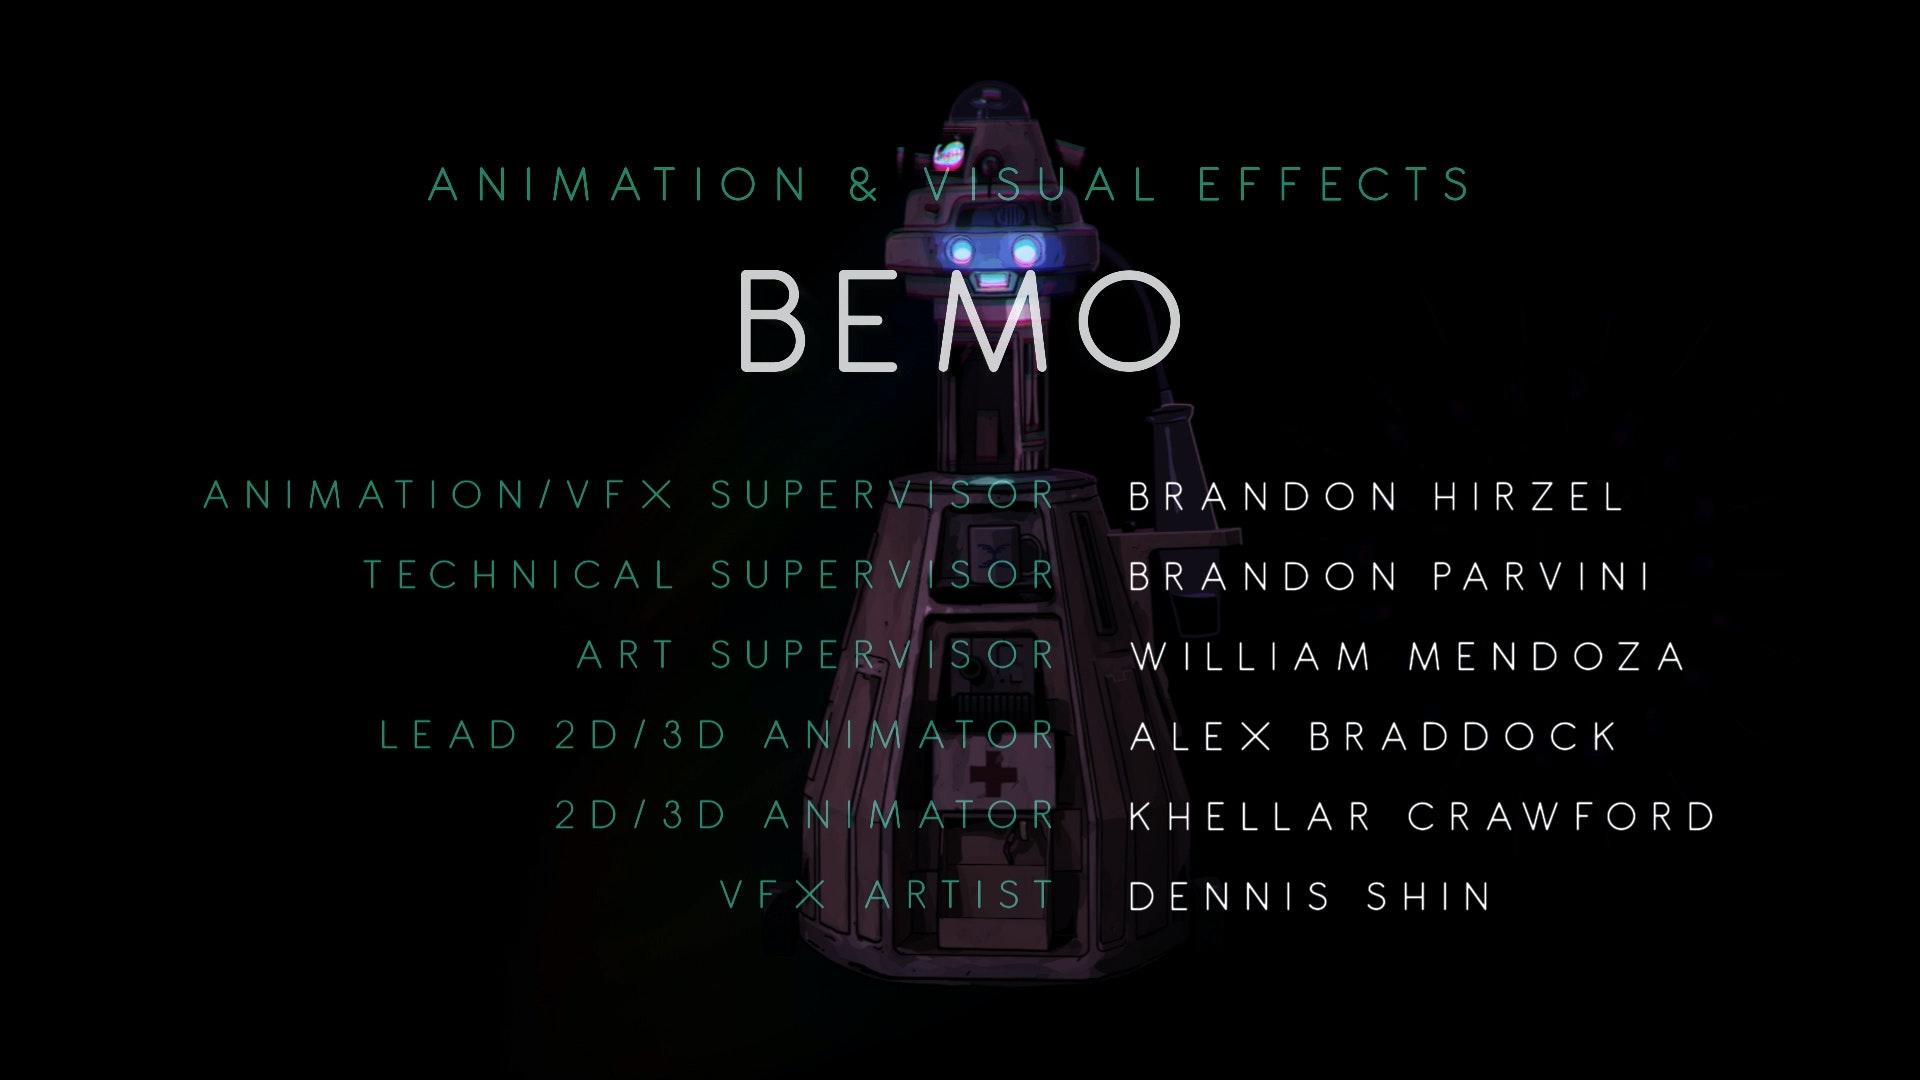 DreamCorpLLC_213_Broadcast_Stereo_Vimeo (1-11-01-21)